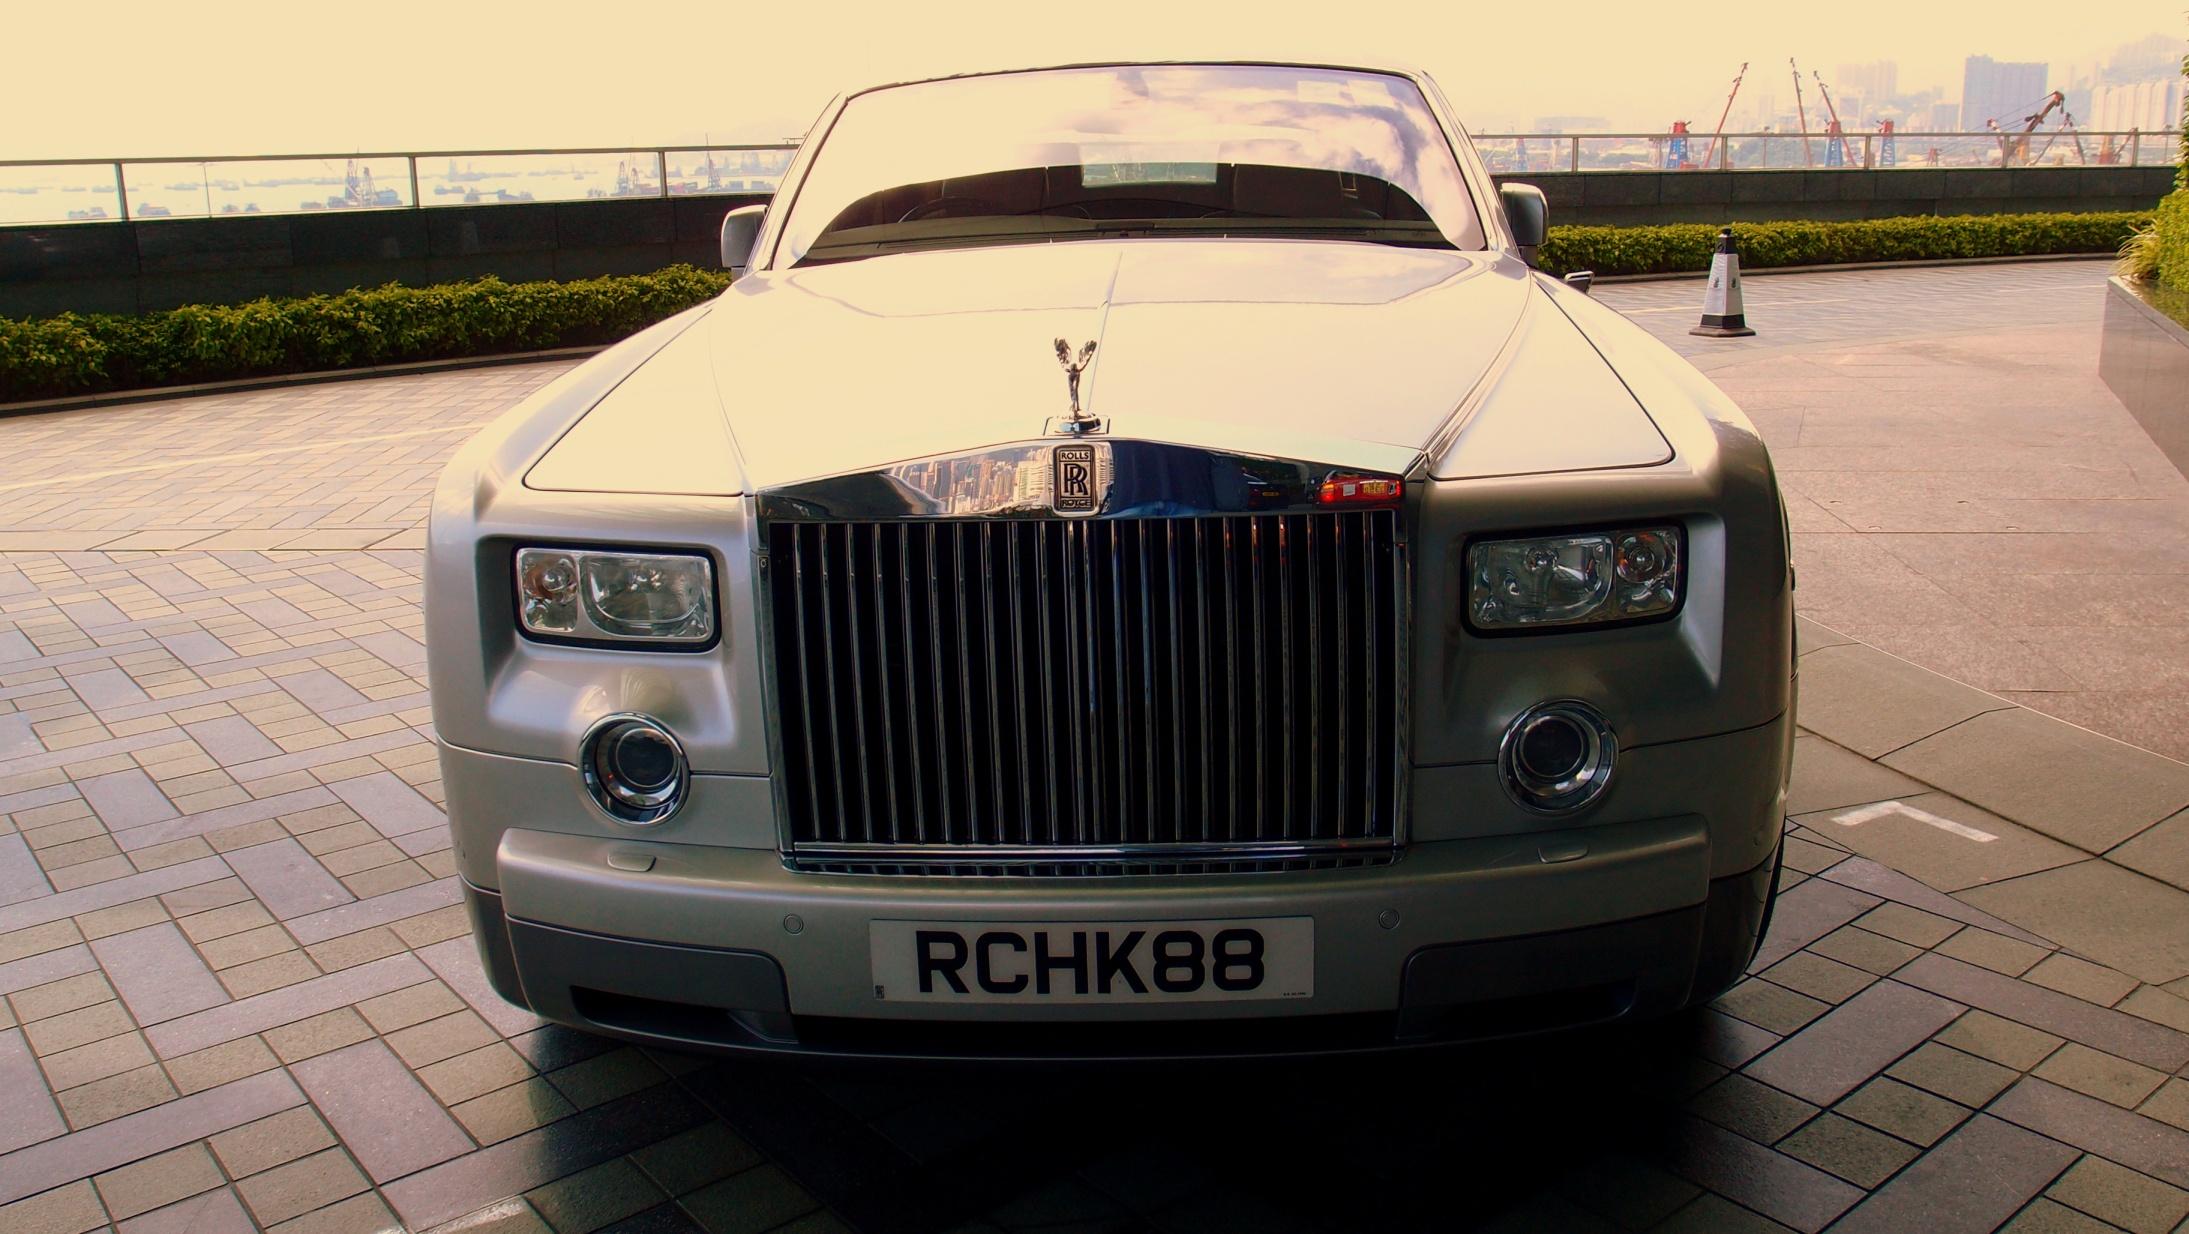 The Ritz Carlton Hotel Rolls Royce